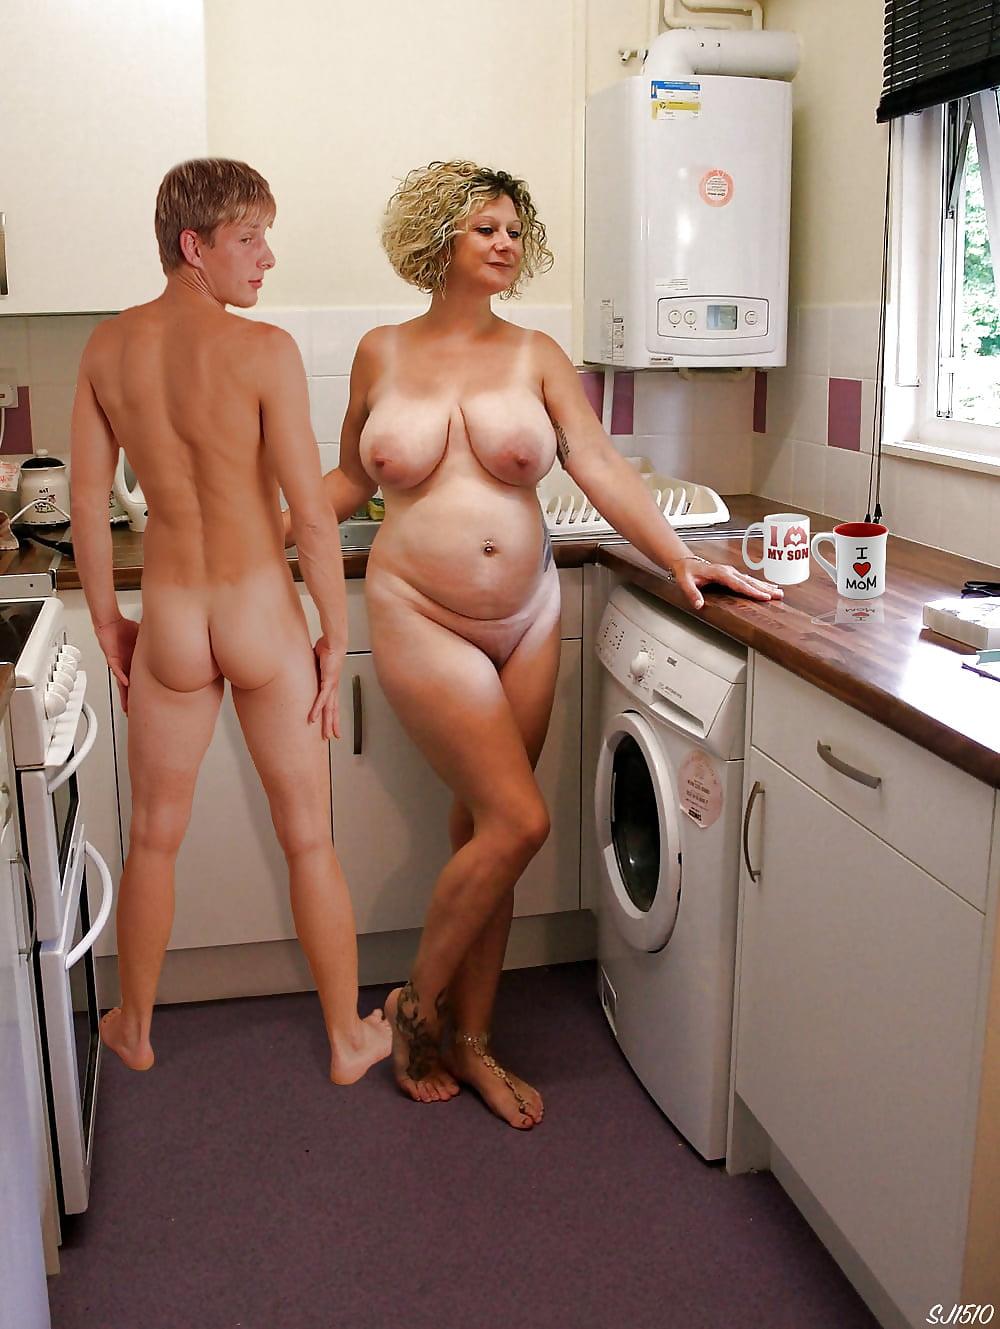 Pics caught nude mom